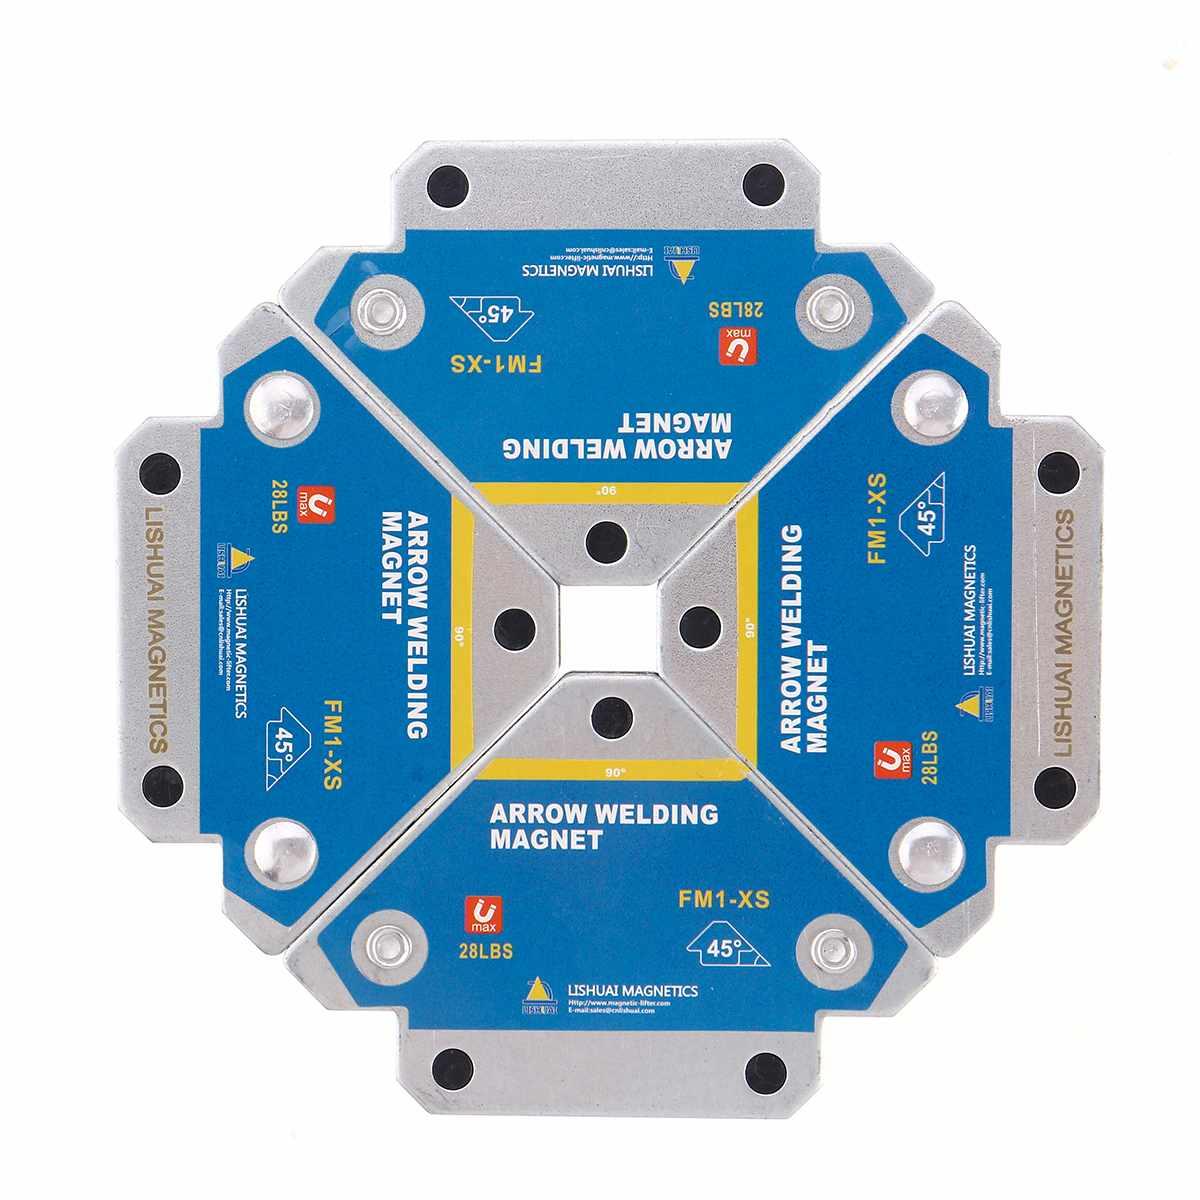 4PCS ריתוך מחזיקי ברזל ריתוך מיצוב מגנטי ריתוך Positioner מתקן פרייט מחזיק עזר איתור כלים